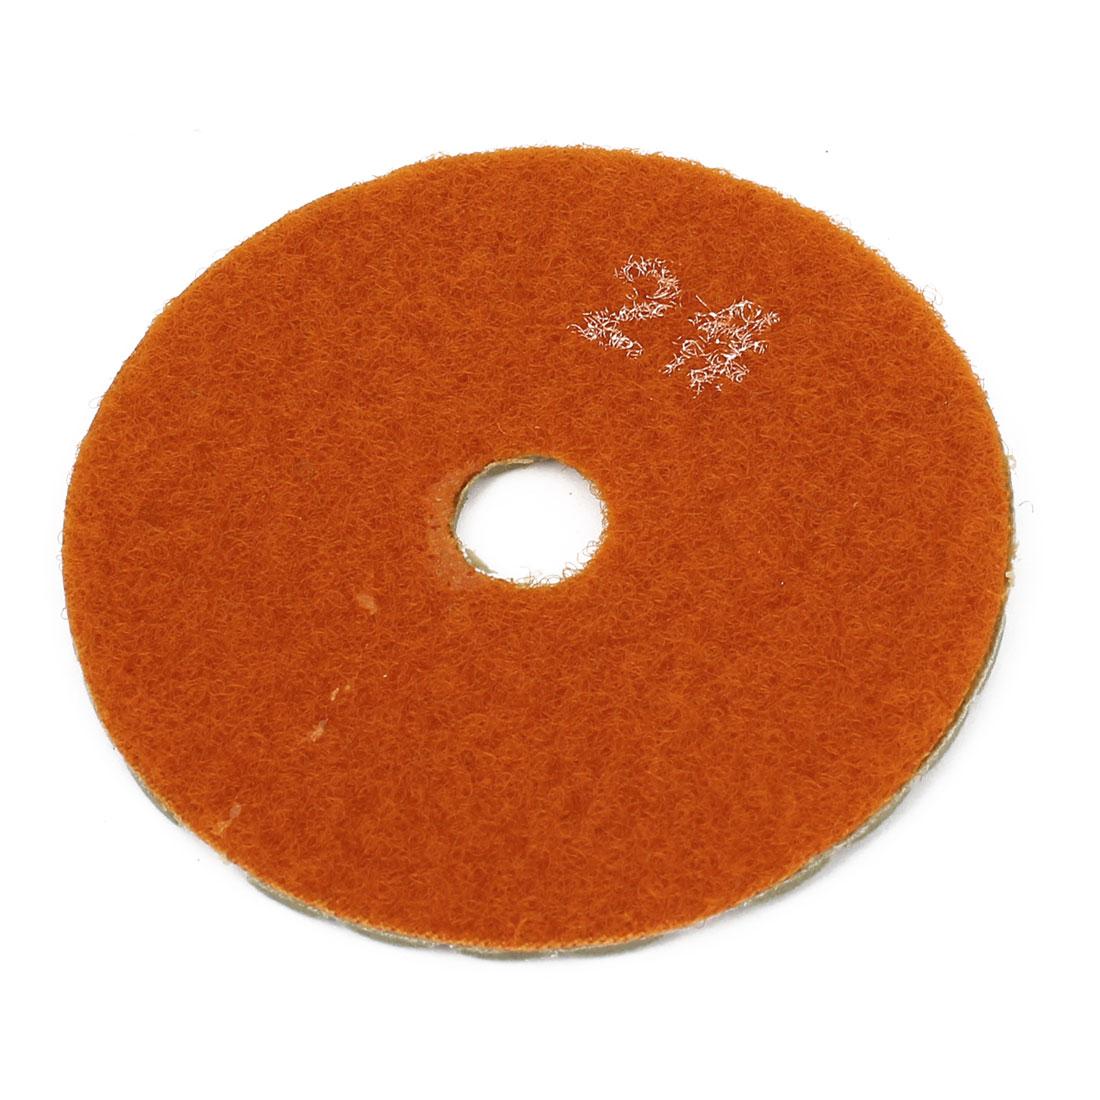 "Diamond Dry Polishing Pad Grit 150 3"" Diameter Khaki Orange for Grinding"